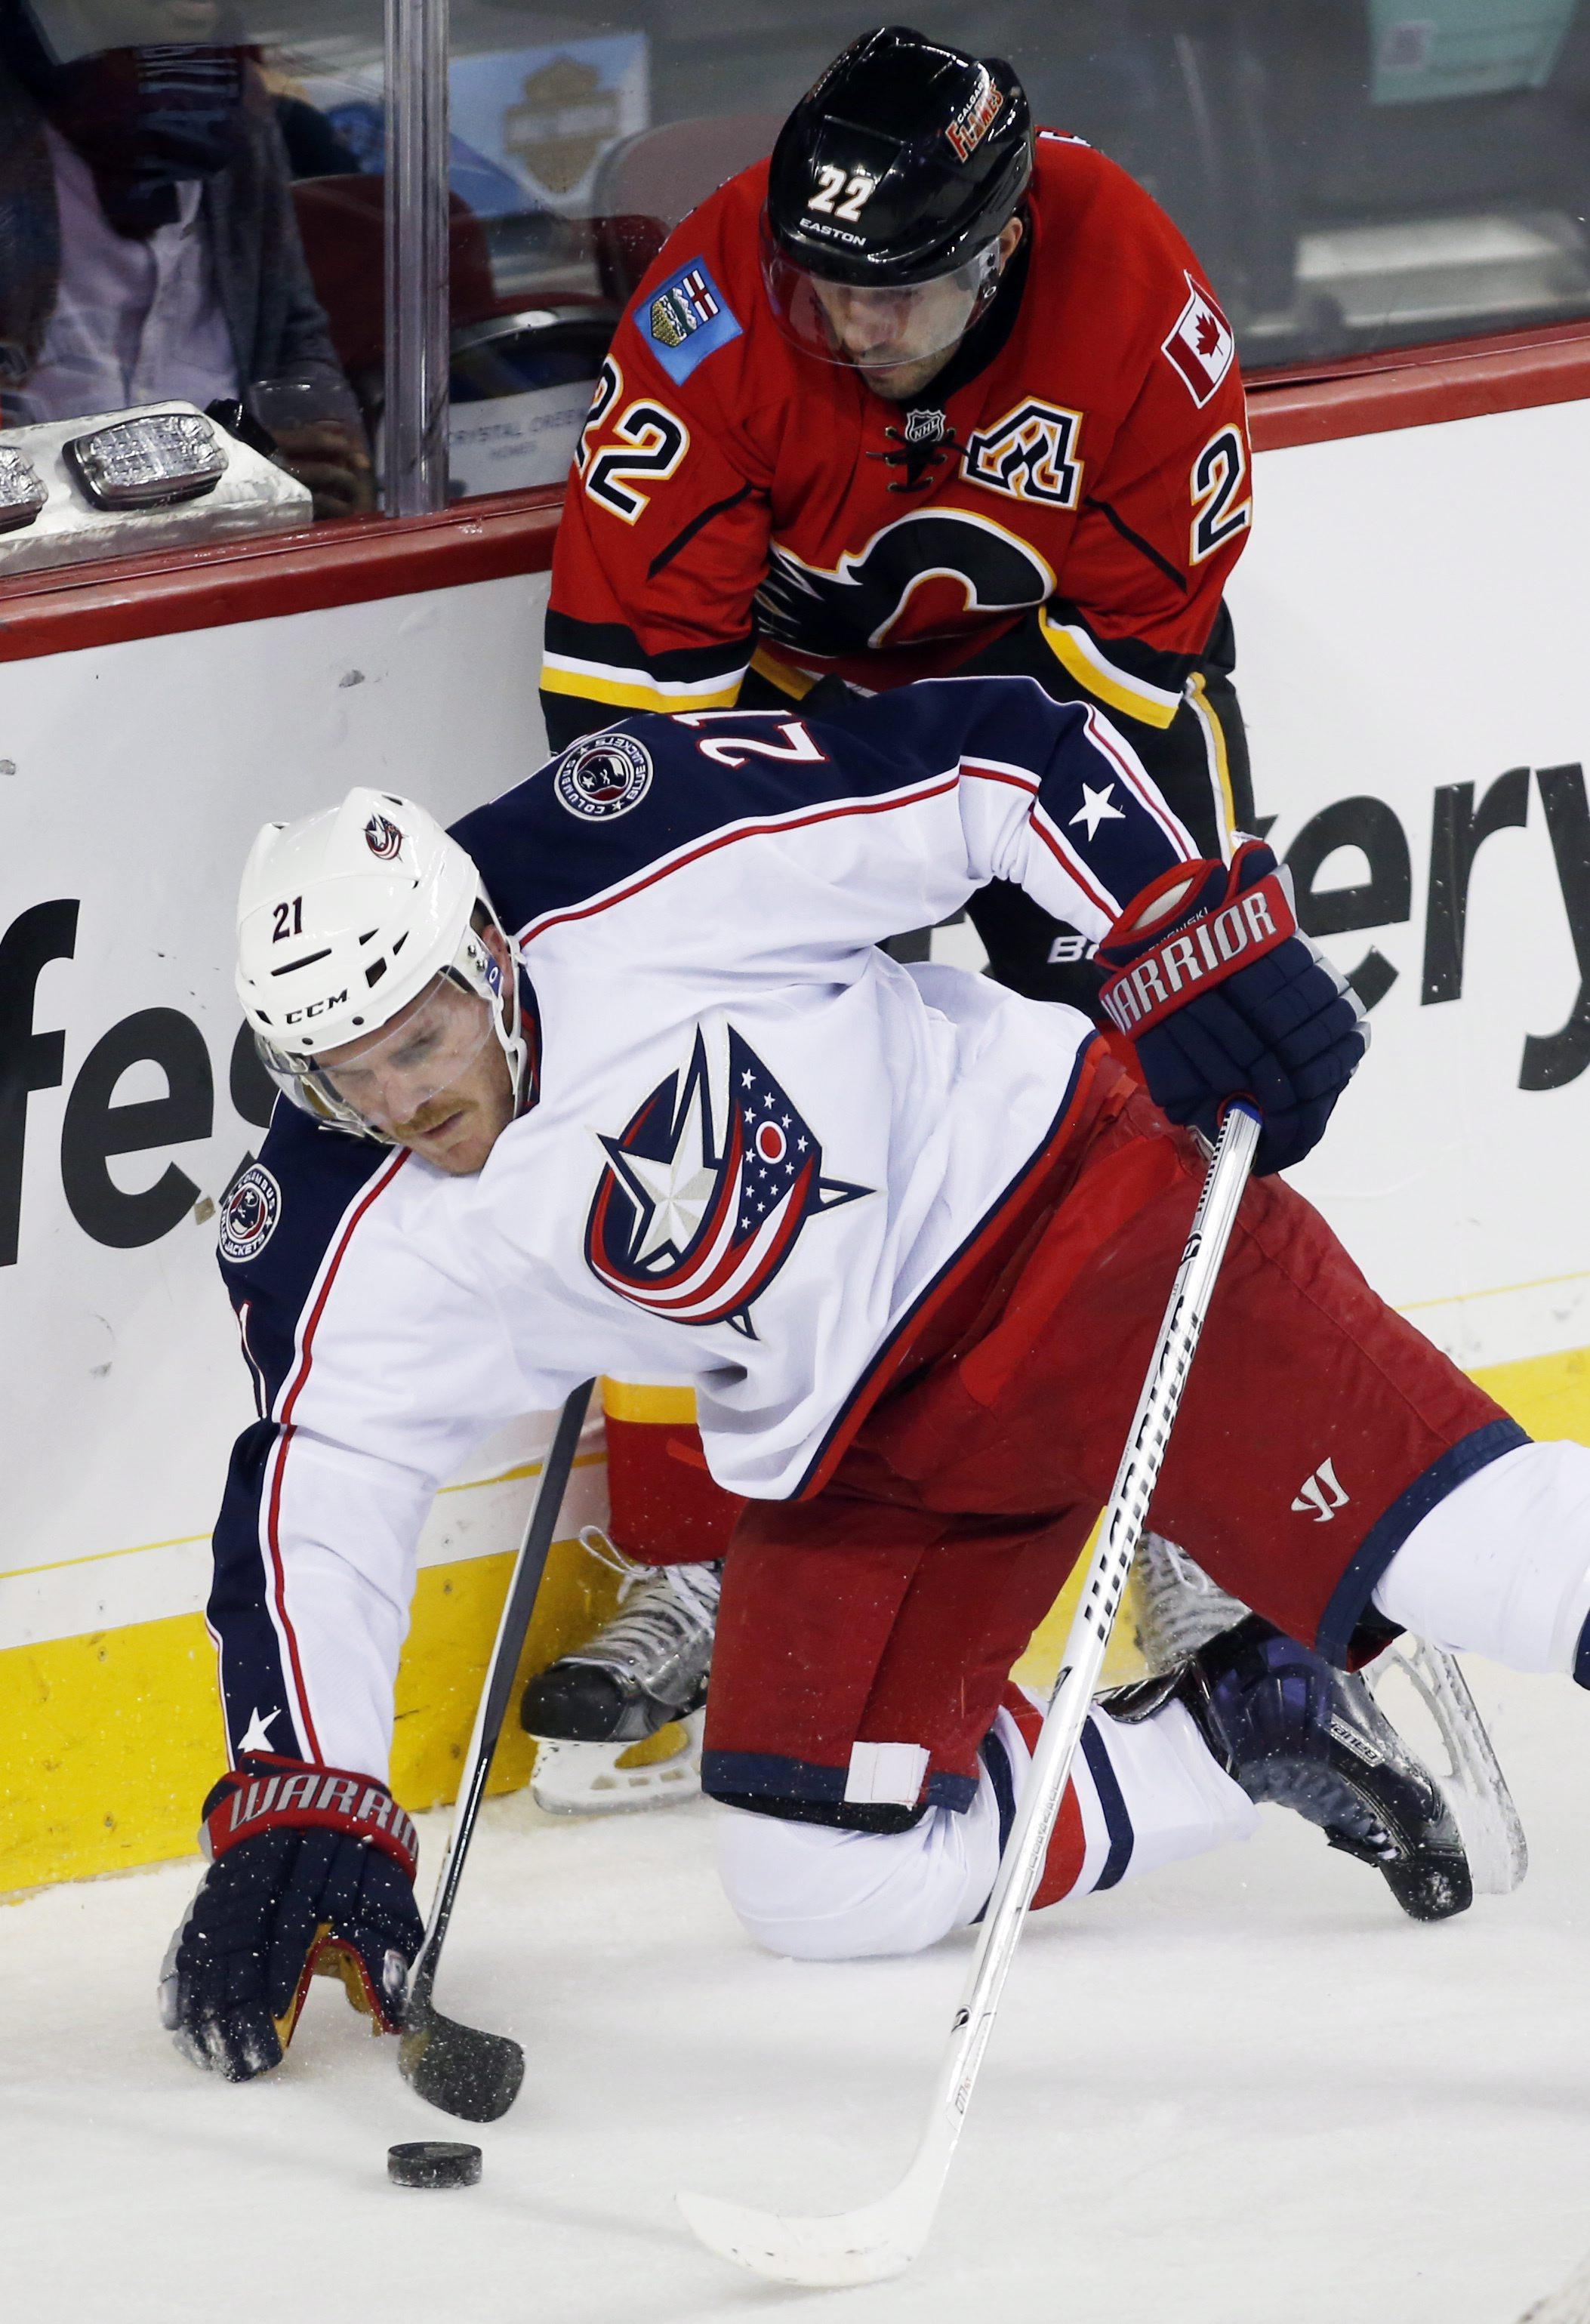 Columbus Blue Jackets' James Wisniewski, left, falls on the stick of Calgary Flames' Lee Stempniak during first period NHL hockey action in Calgary, Alberta, Wednesday, Nov. 20, 2013